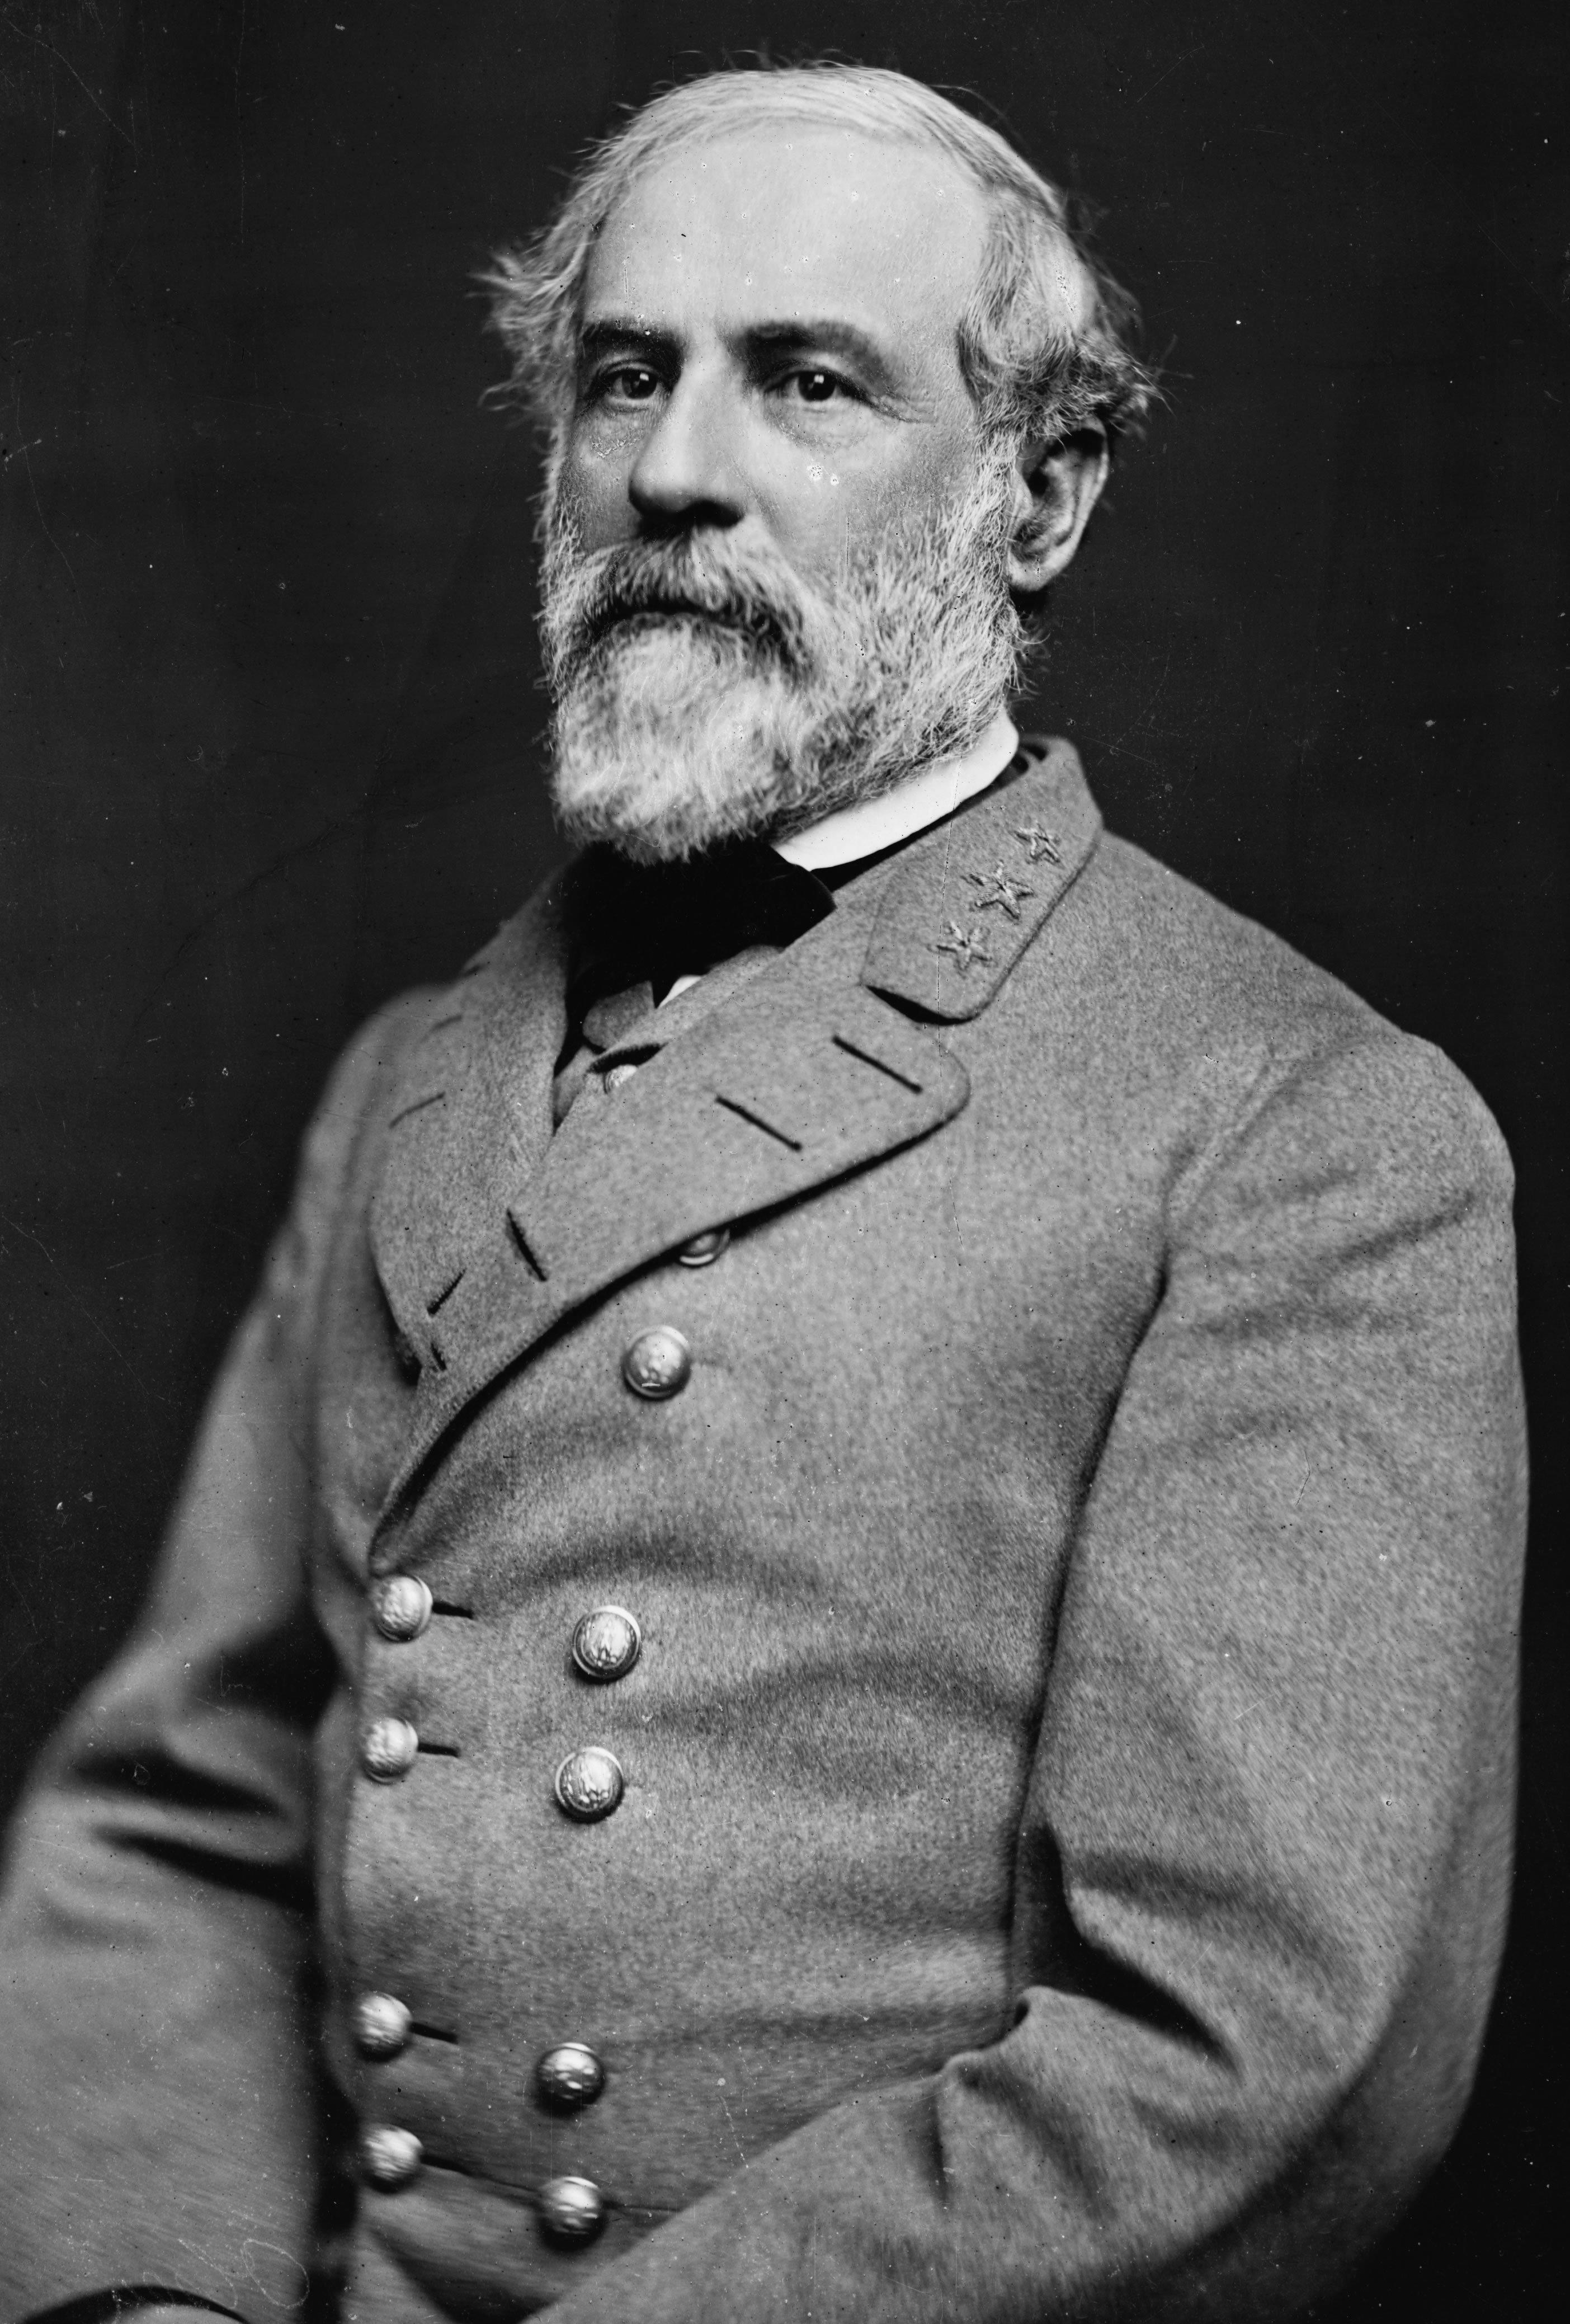 Robert E. Lee Descendant Slams Trump Over Praise For Confederate General